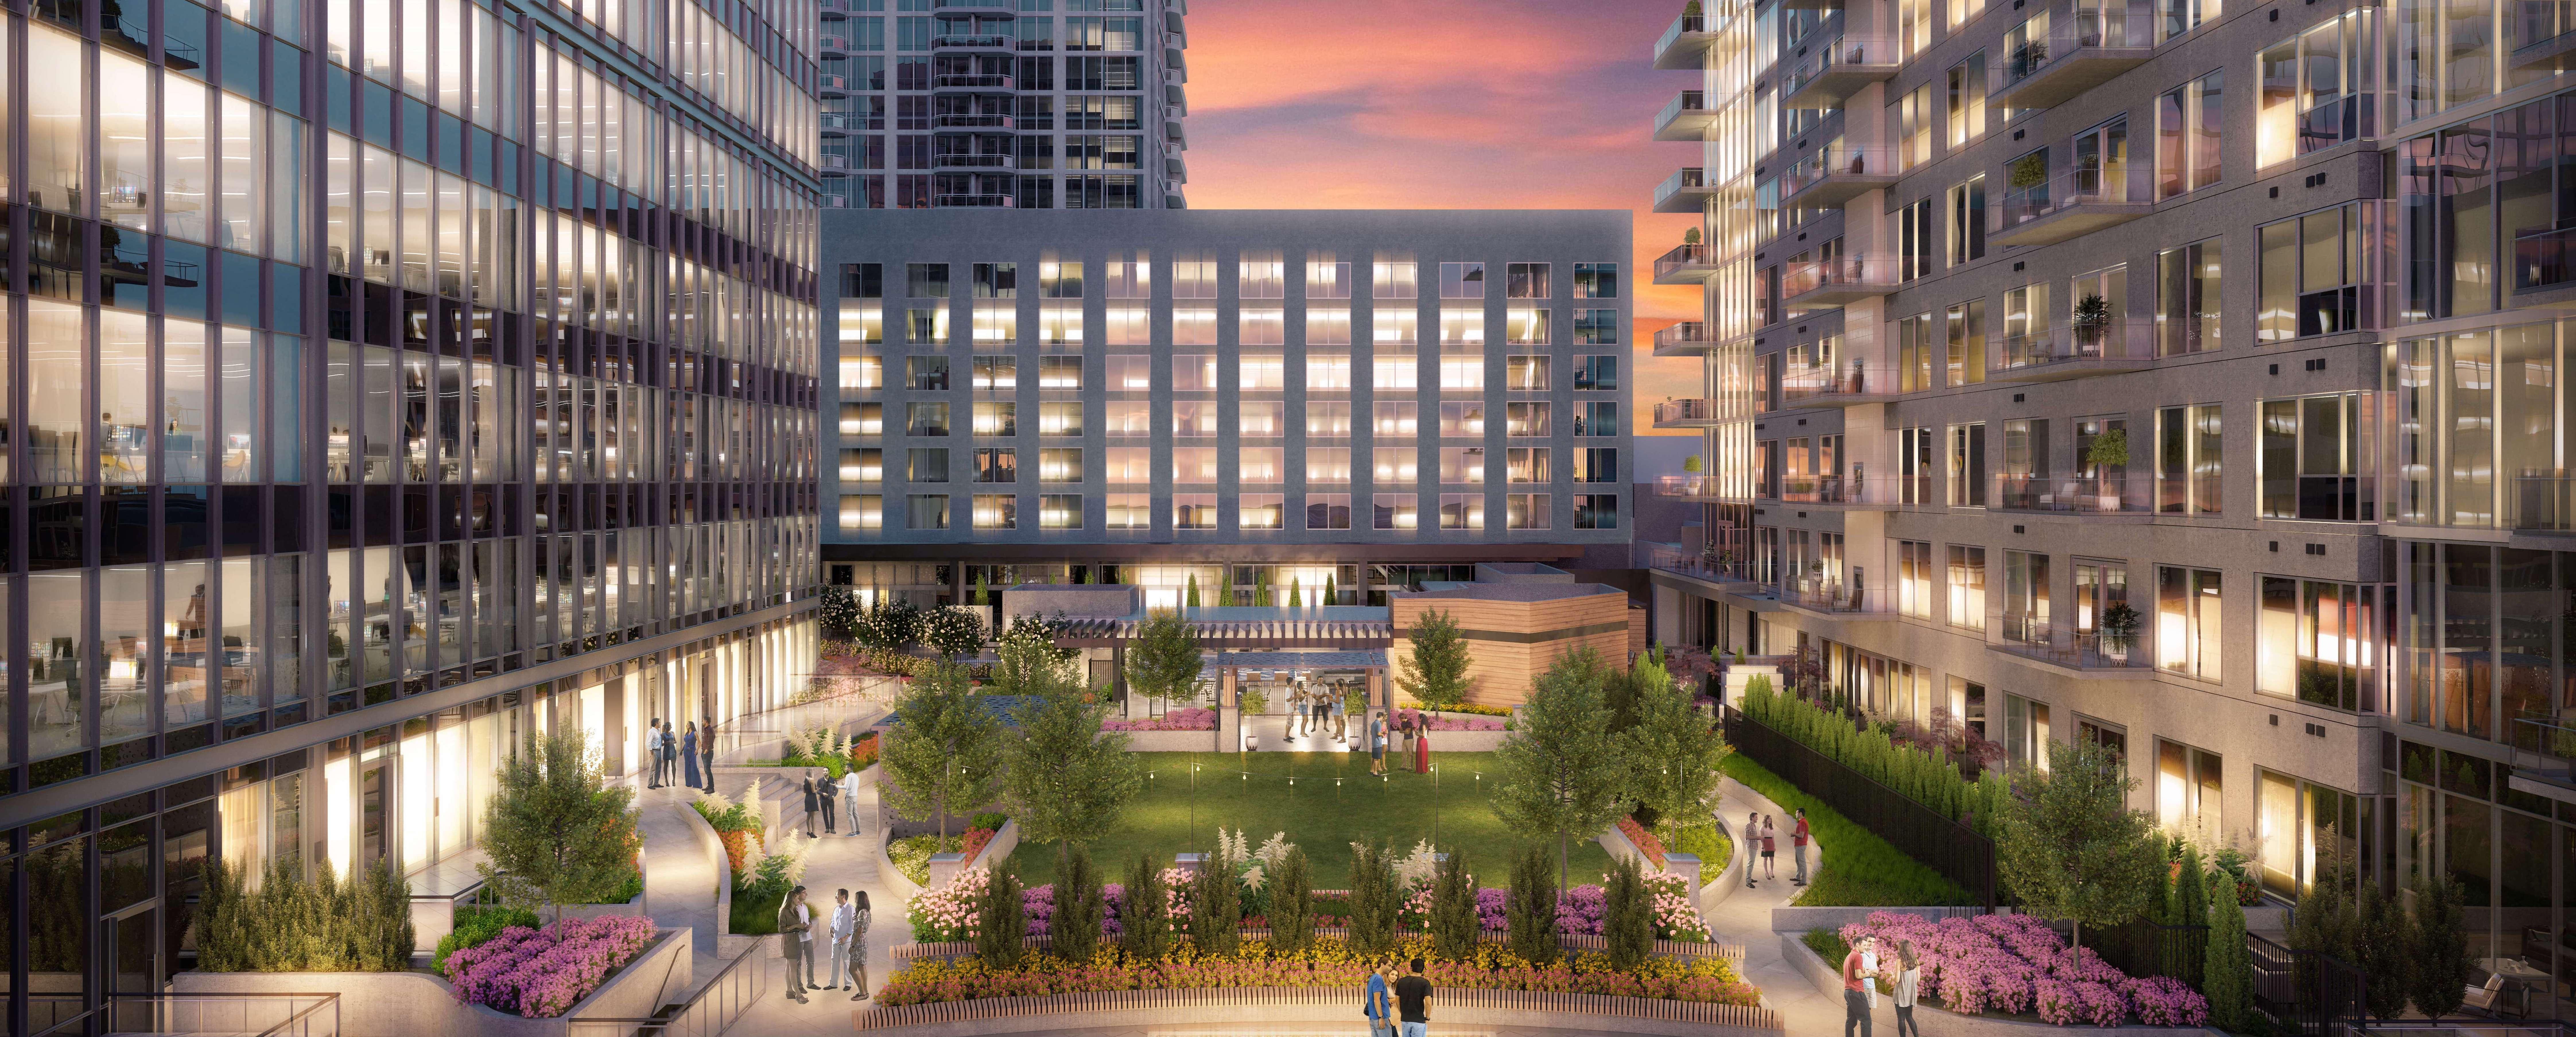 A dusk rendering of the Epicurean Atlanta courtyard.